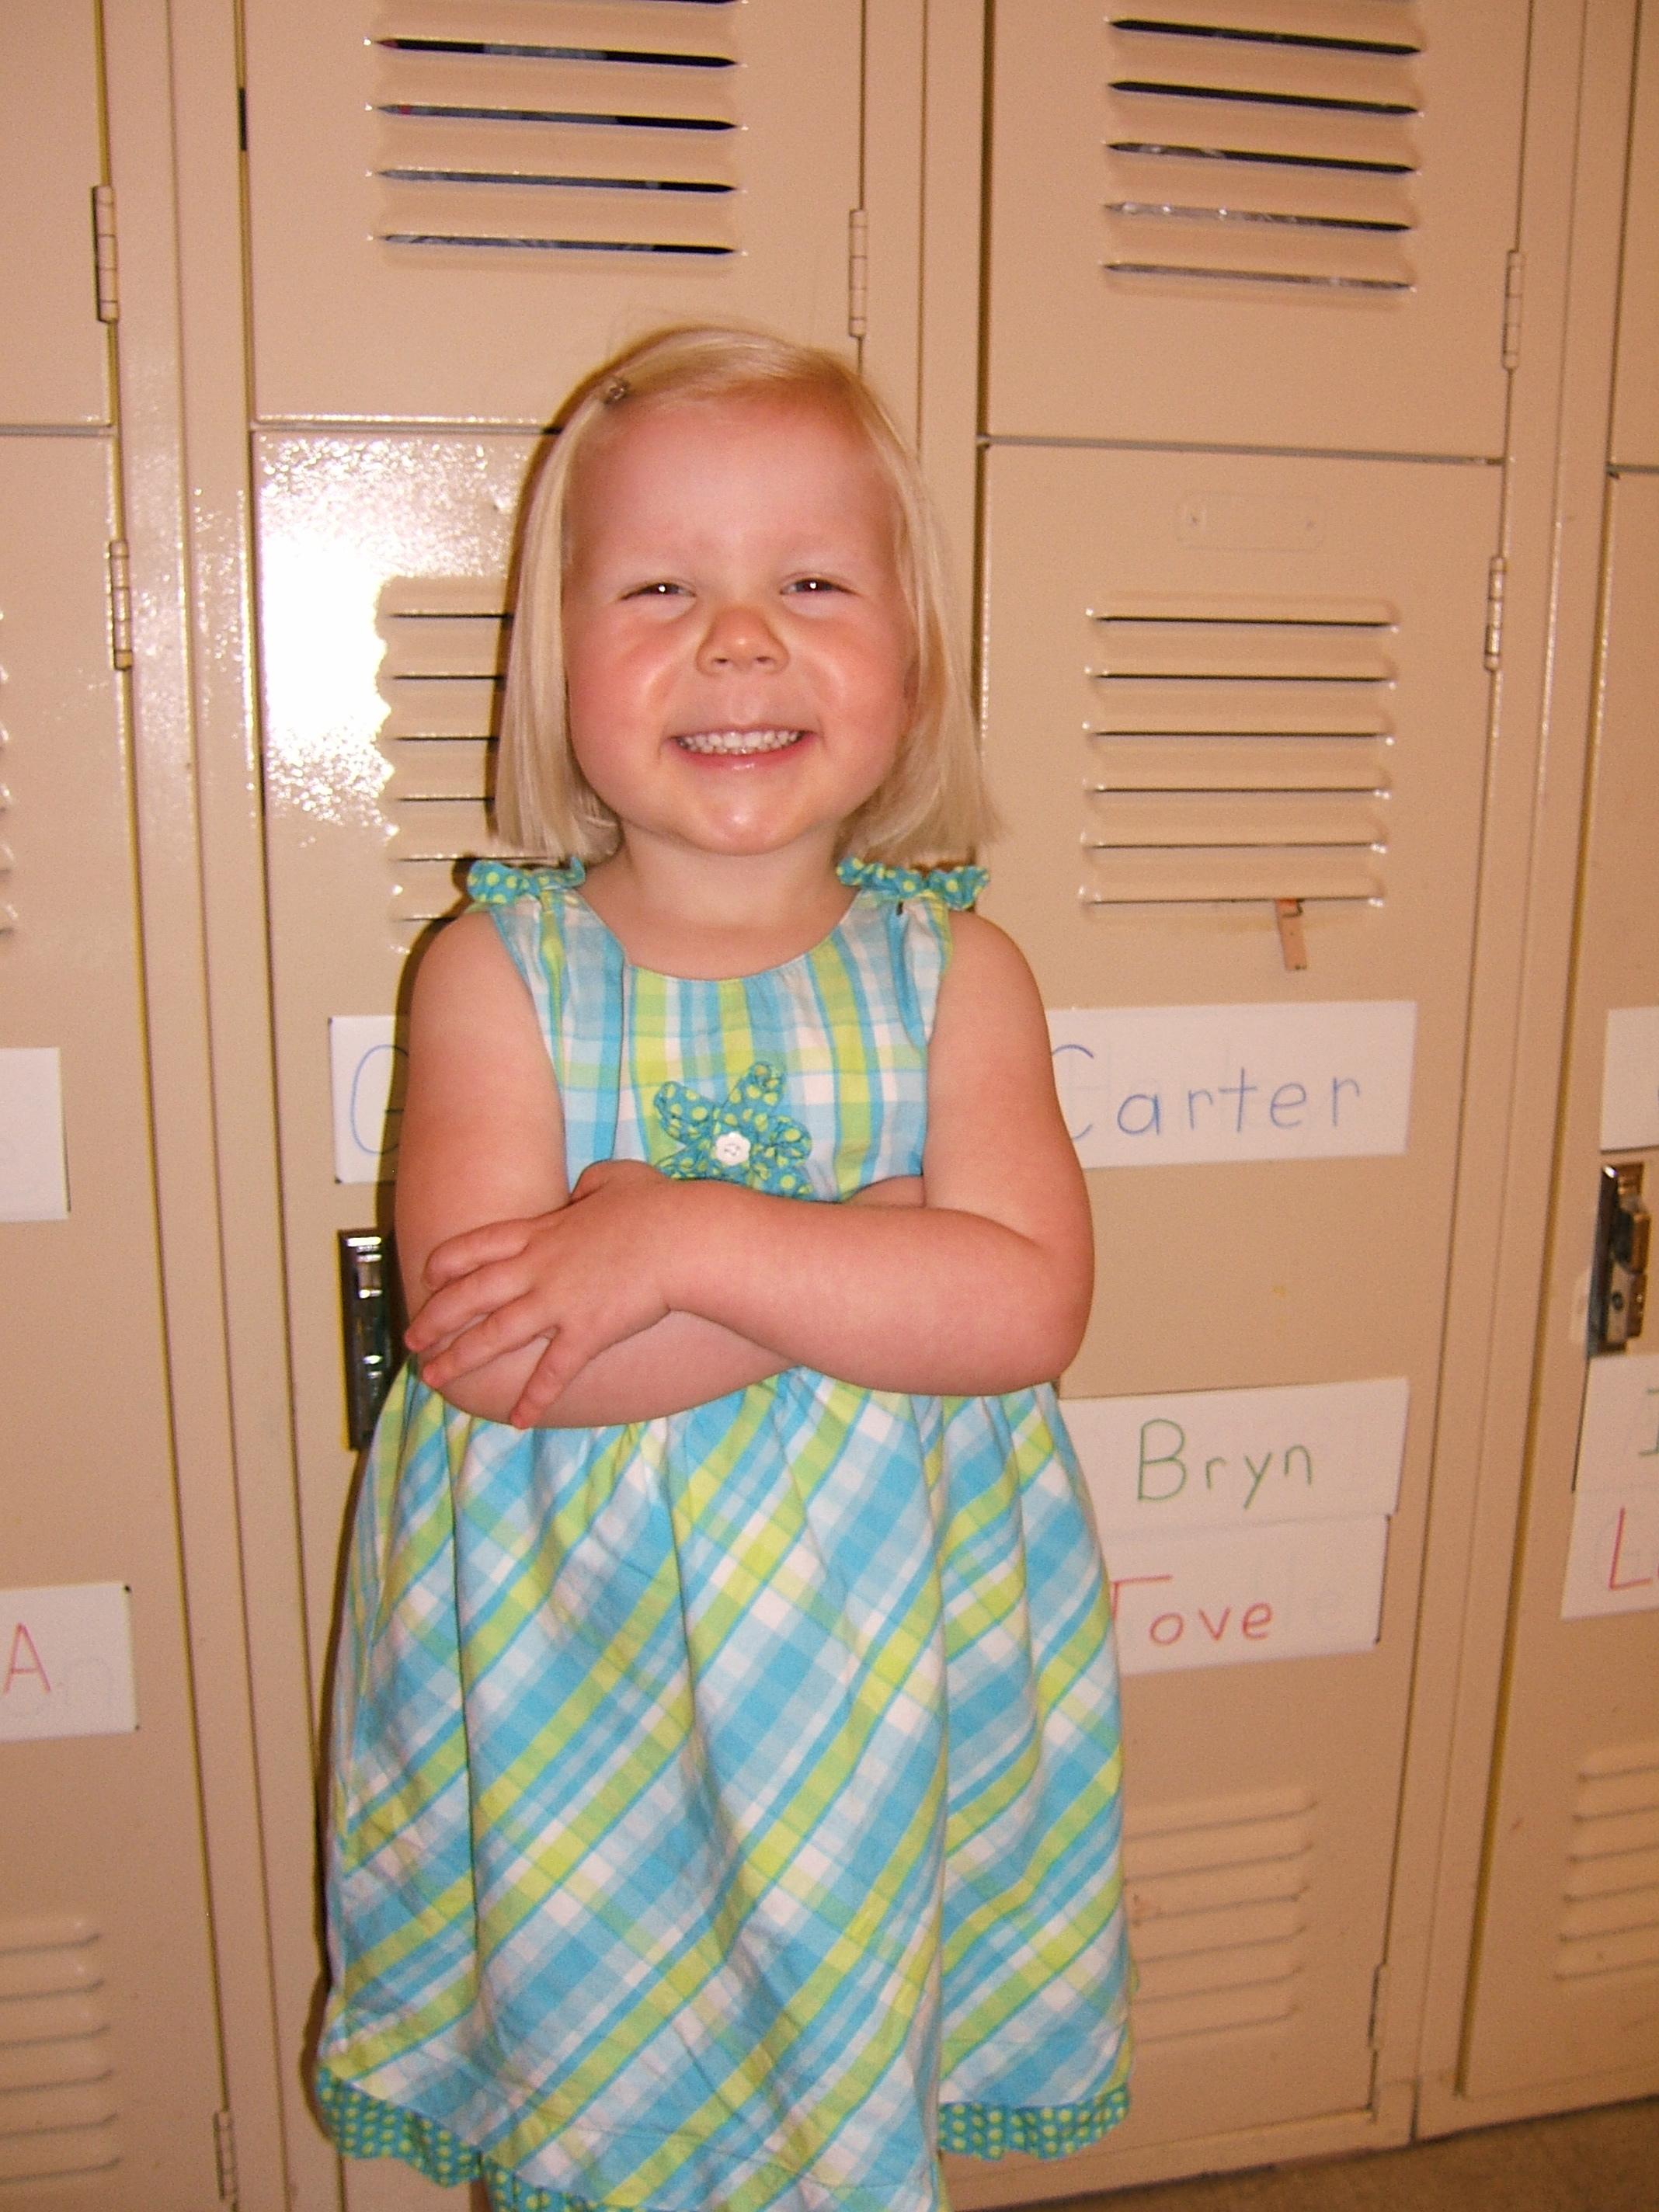 Genevieve at Preschool (September 2009)